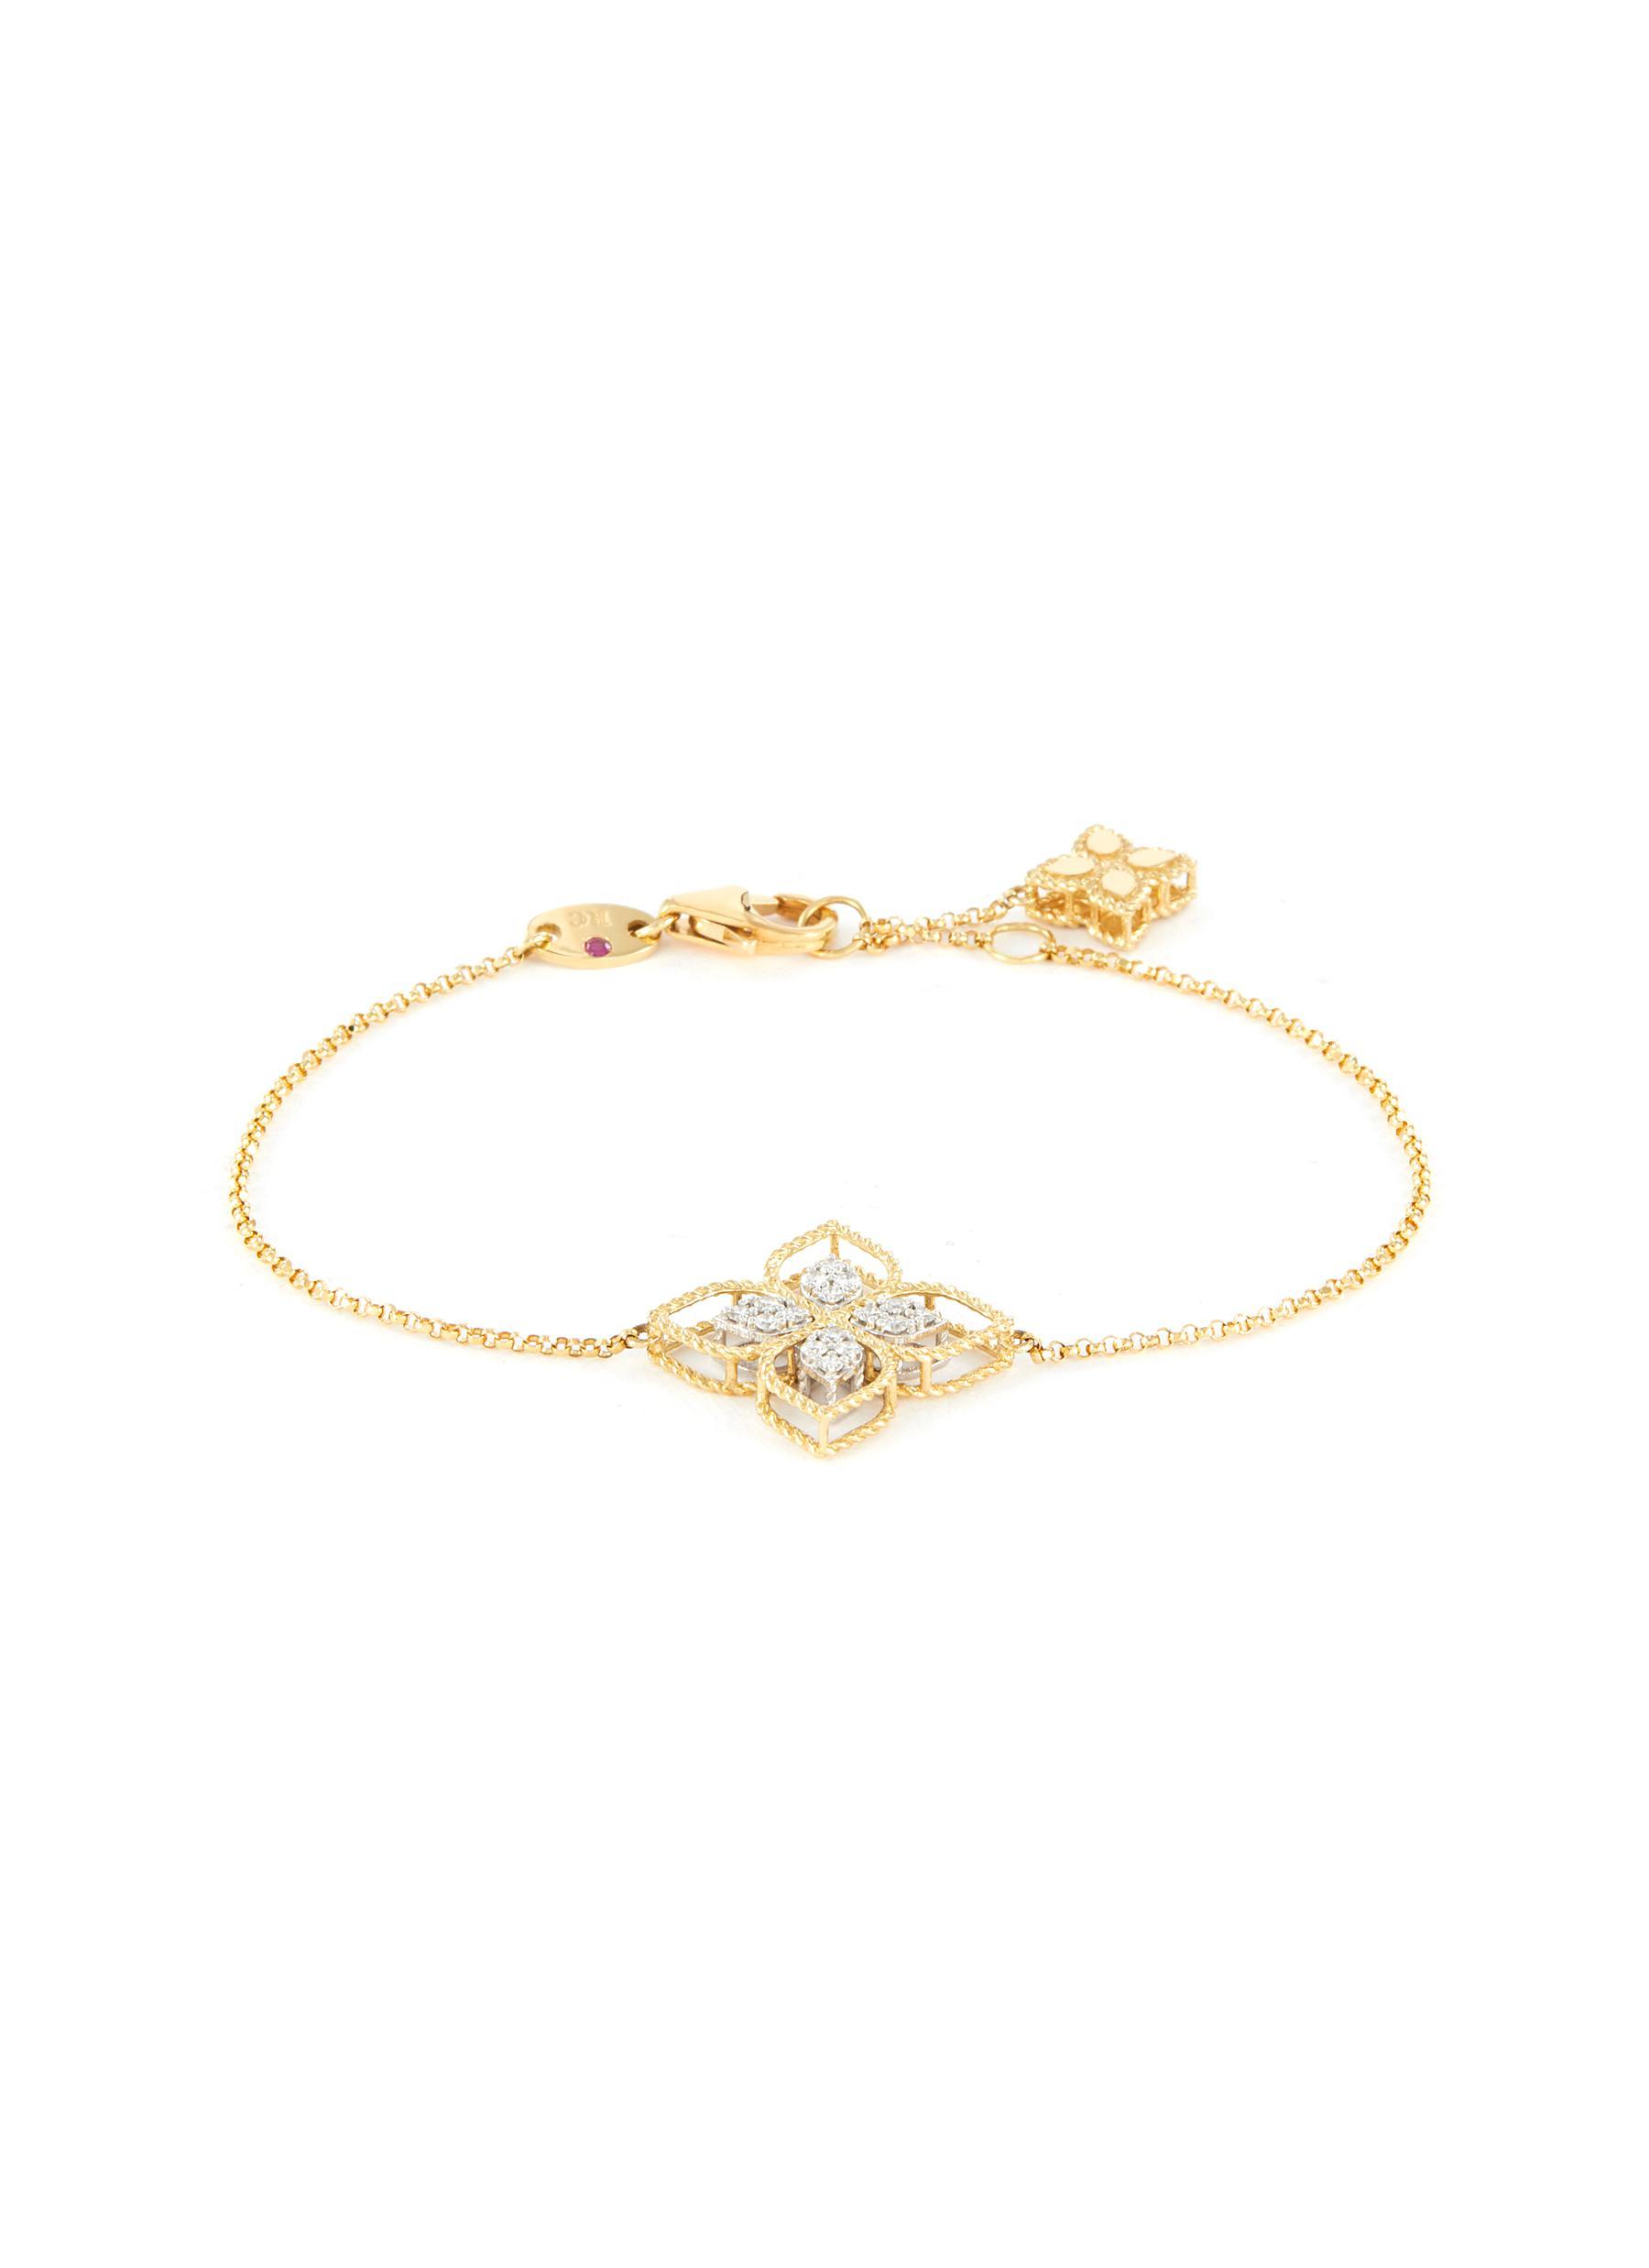 dd8dce5b949bd ROBERTO COIN | 'Princess Flower' diamond 18k yellow gold charm ...